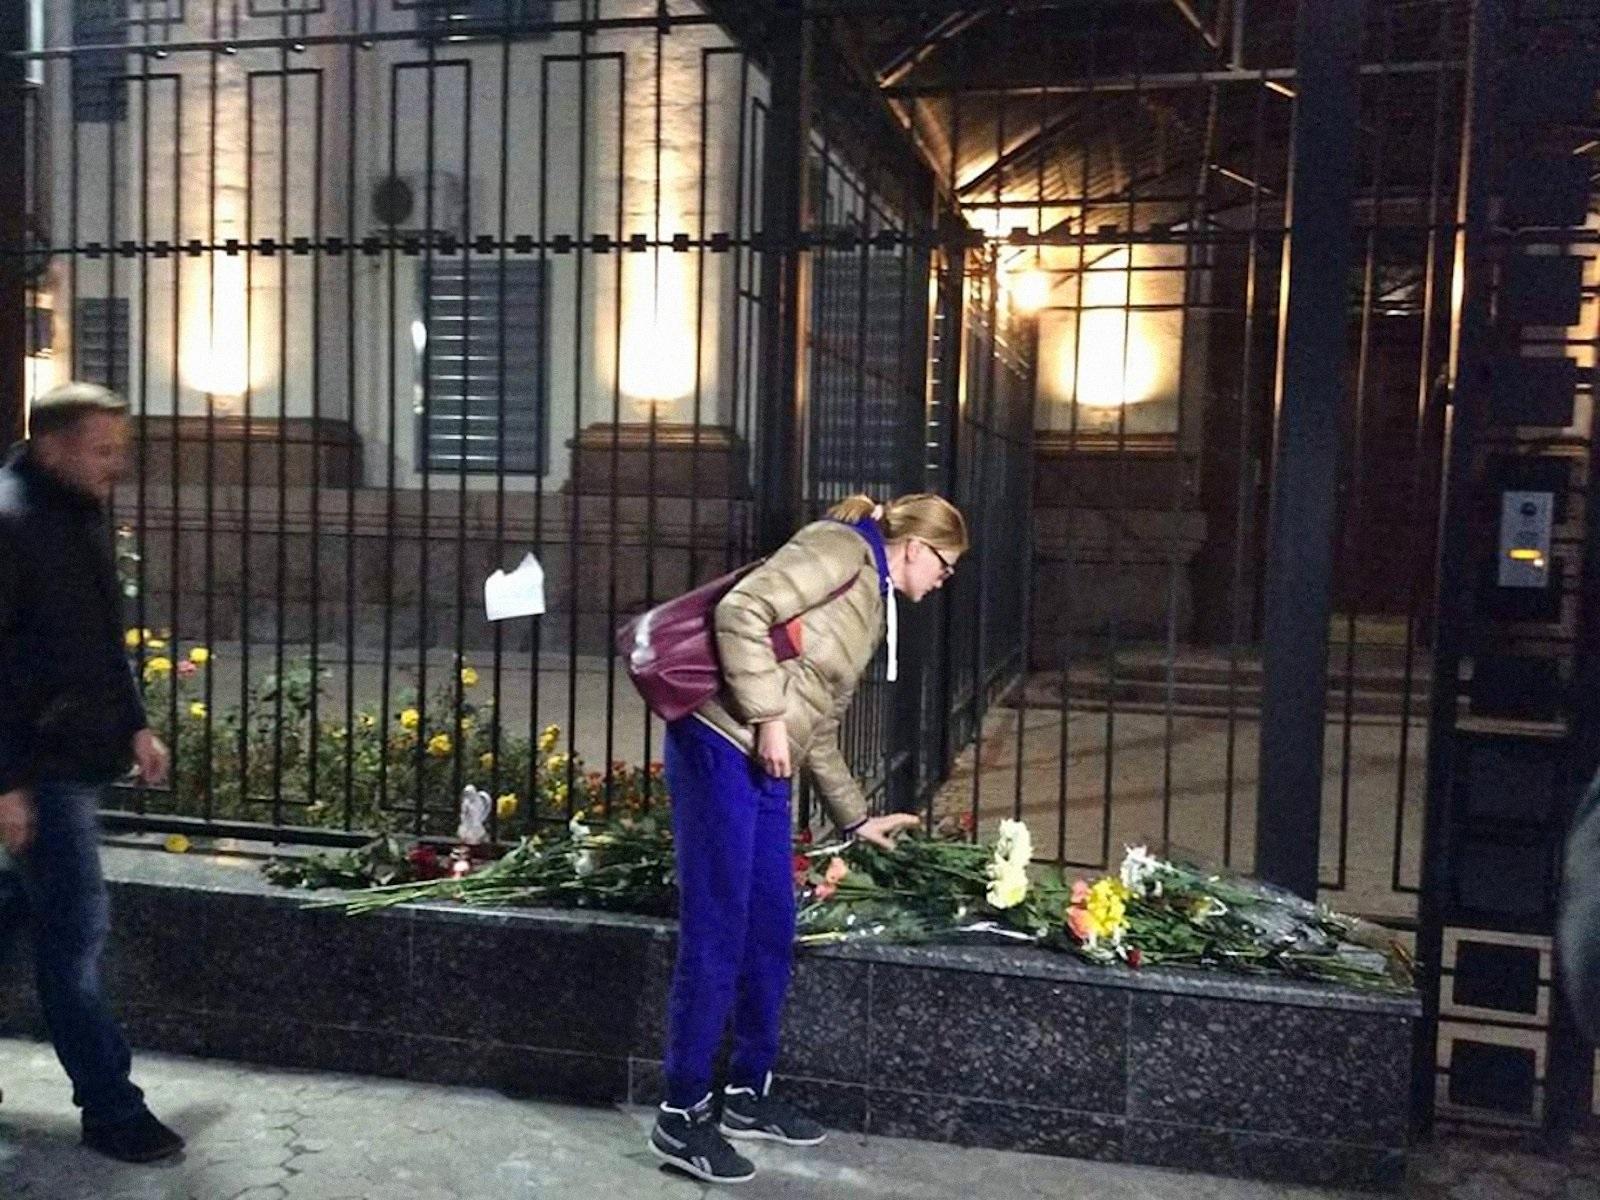 00 kiev embassy russia airliner crash 01 311015